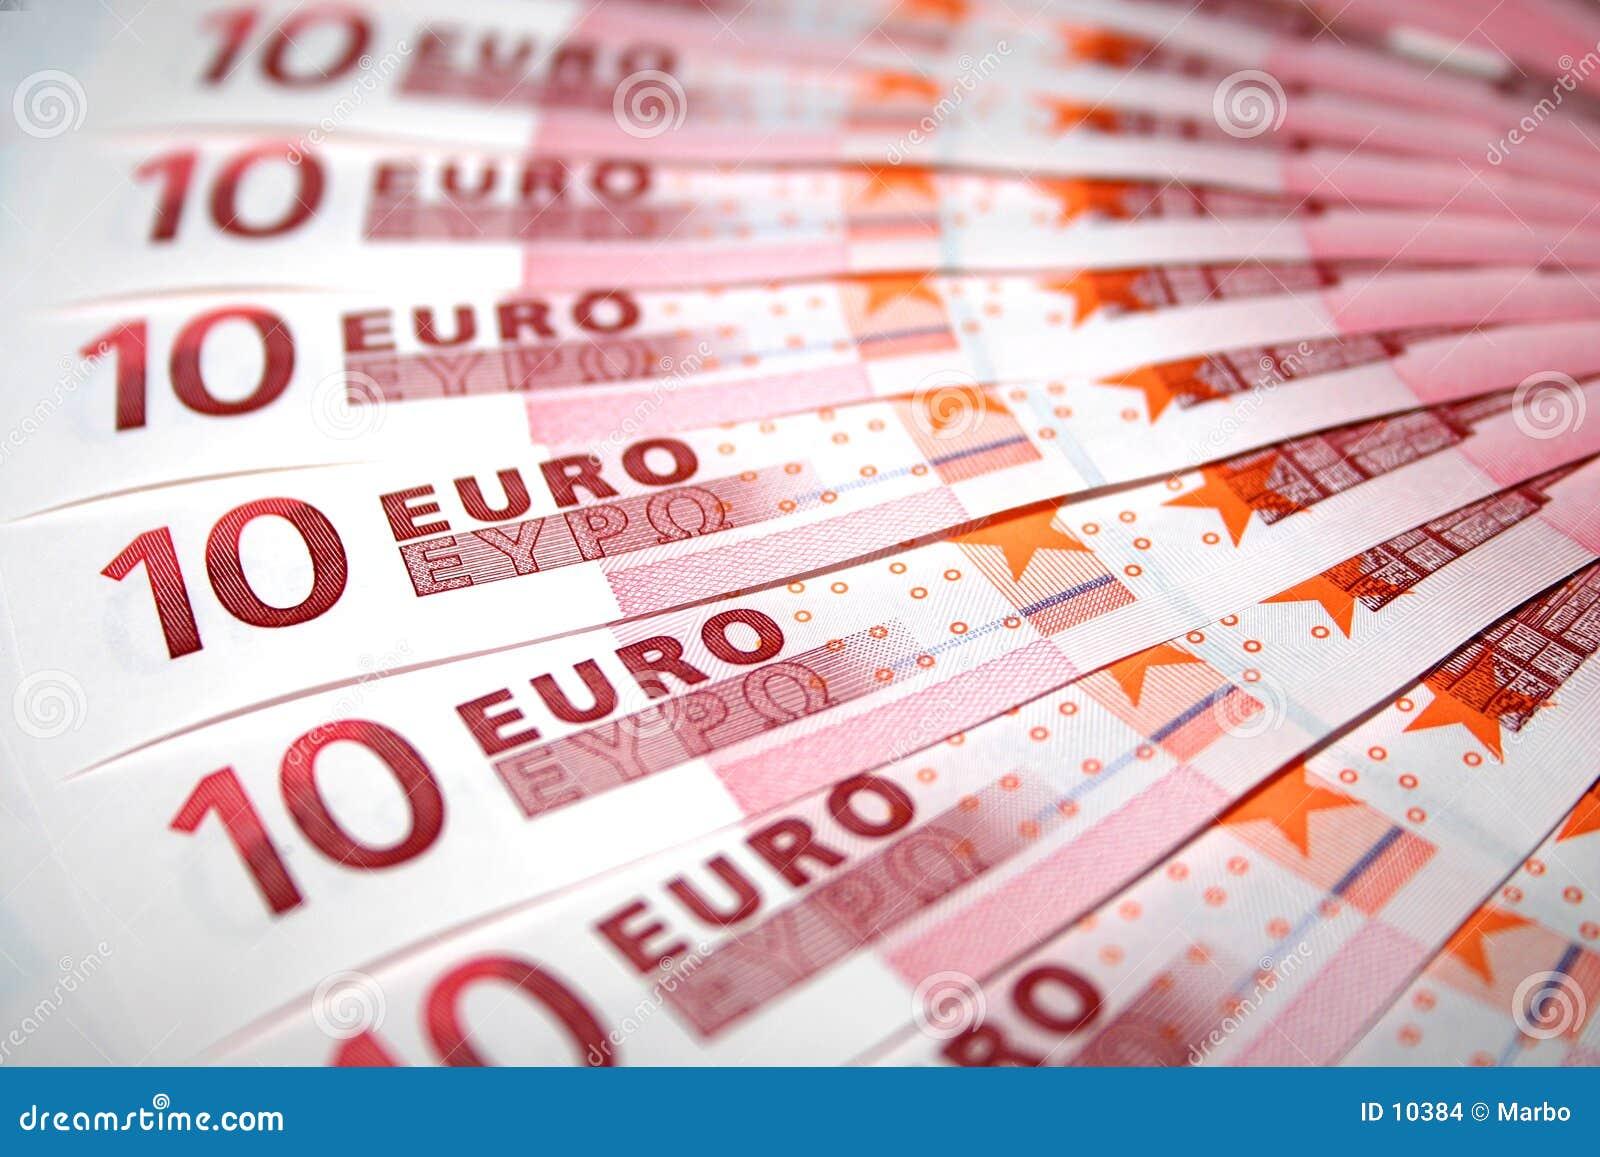 10 Euroanmerkungen